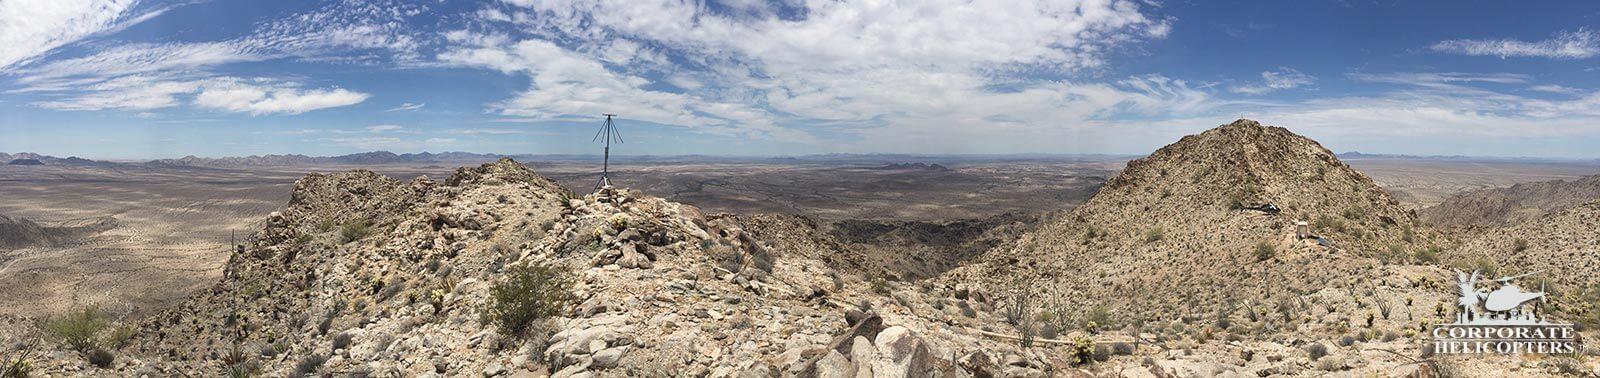 Satellite tech crew transport via helicopter in the desert.